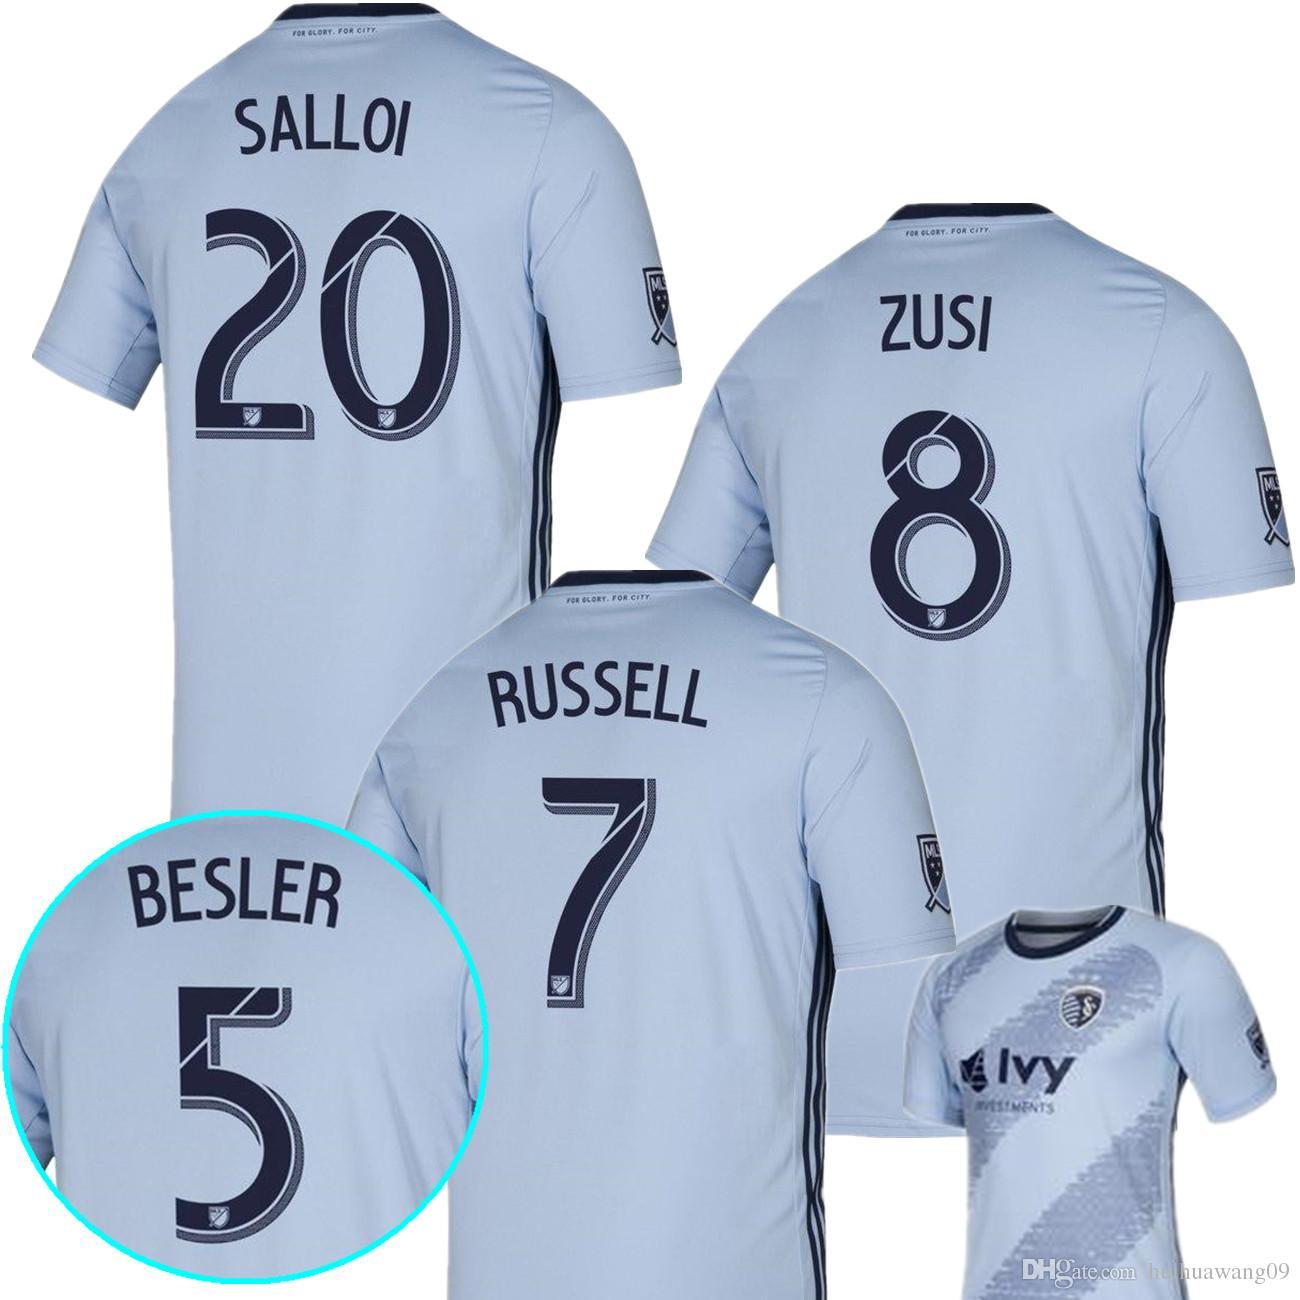 new york 95aed e640c New 2019 2020 Sporting Kansas City MLS Soccer Jerseys ZUSI SALLOI RUSSELL  ILIE Home jersey Camiseta de futbol Sporting KC football shirt